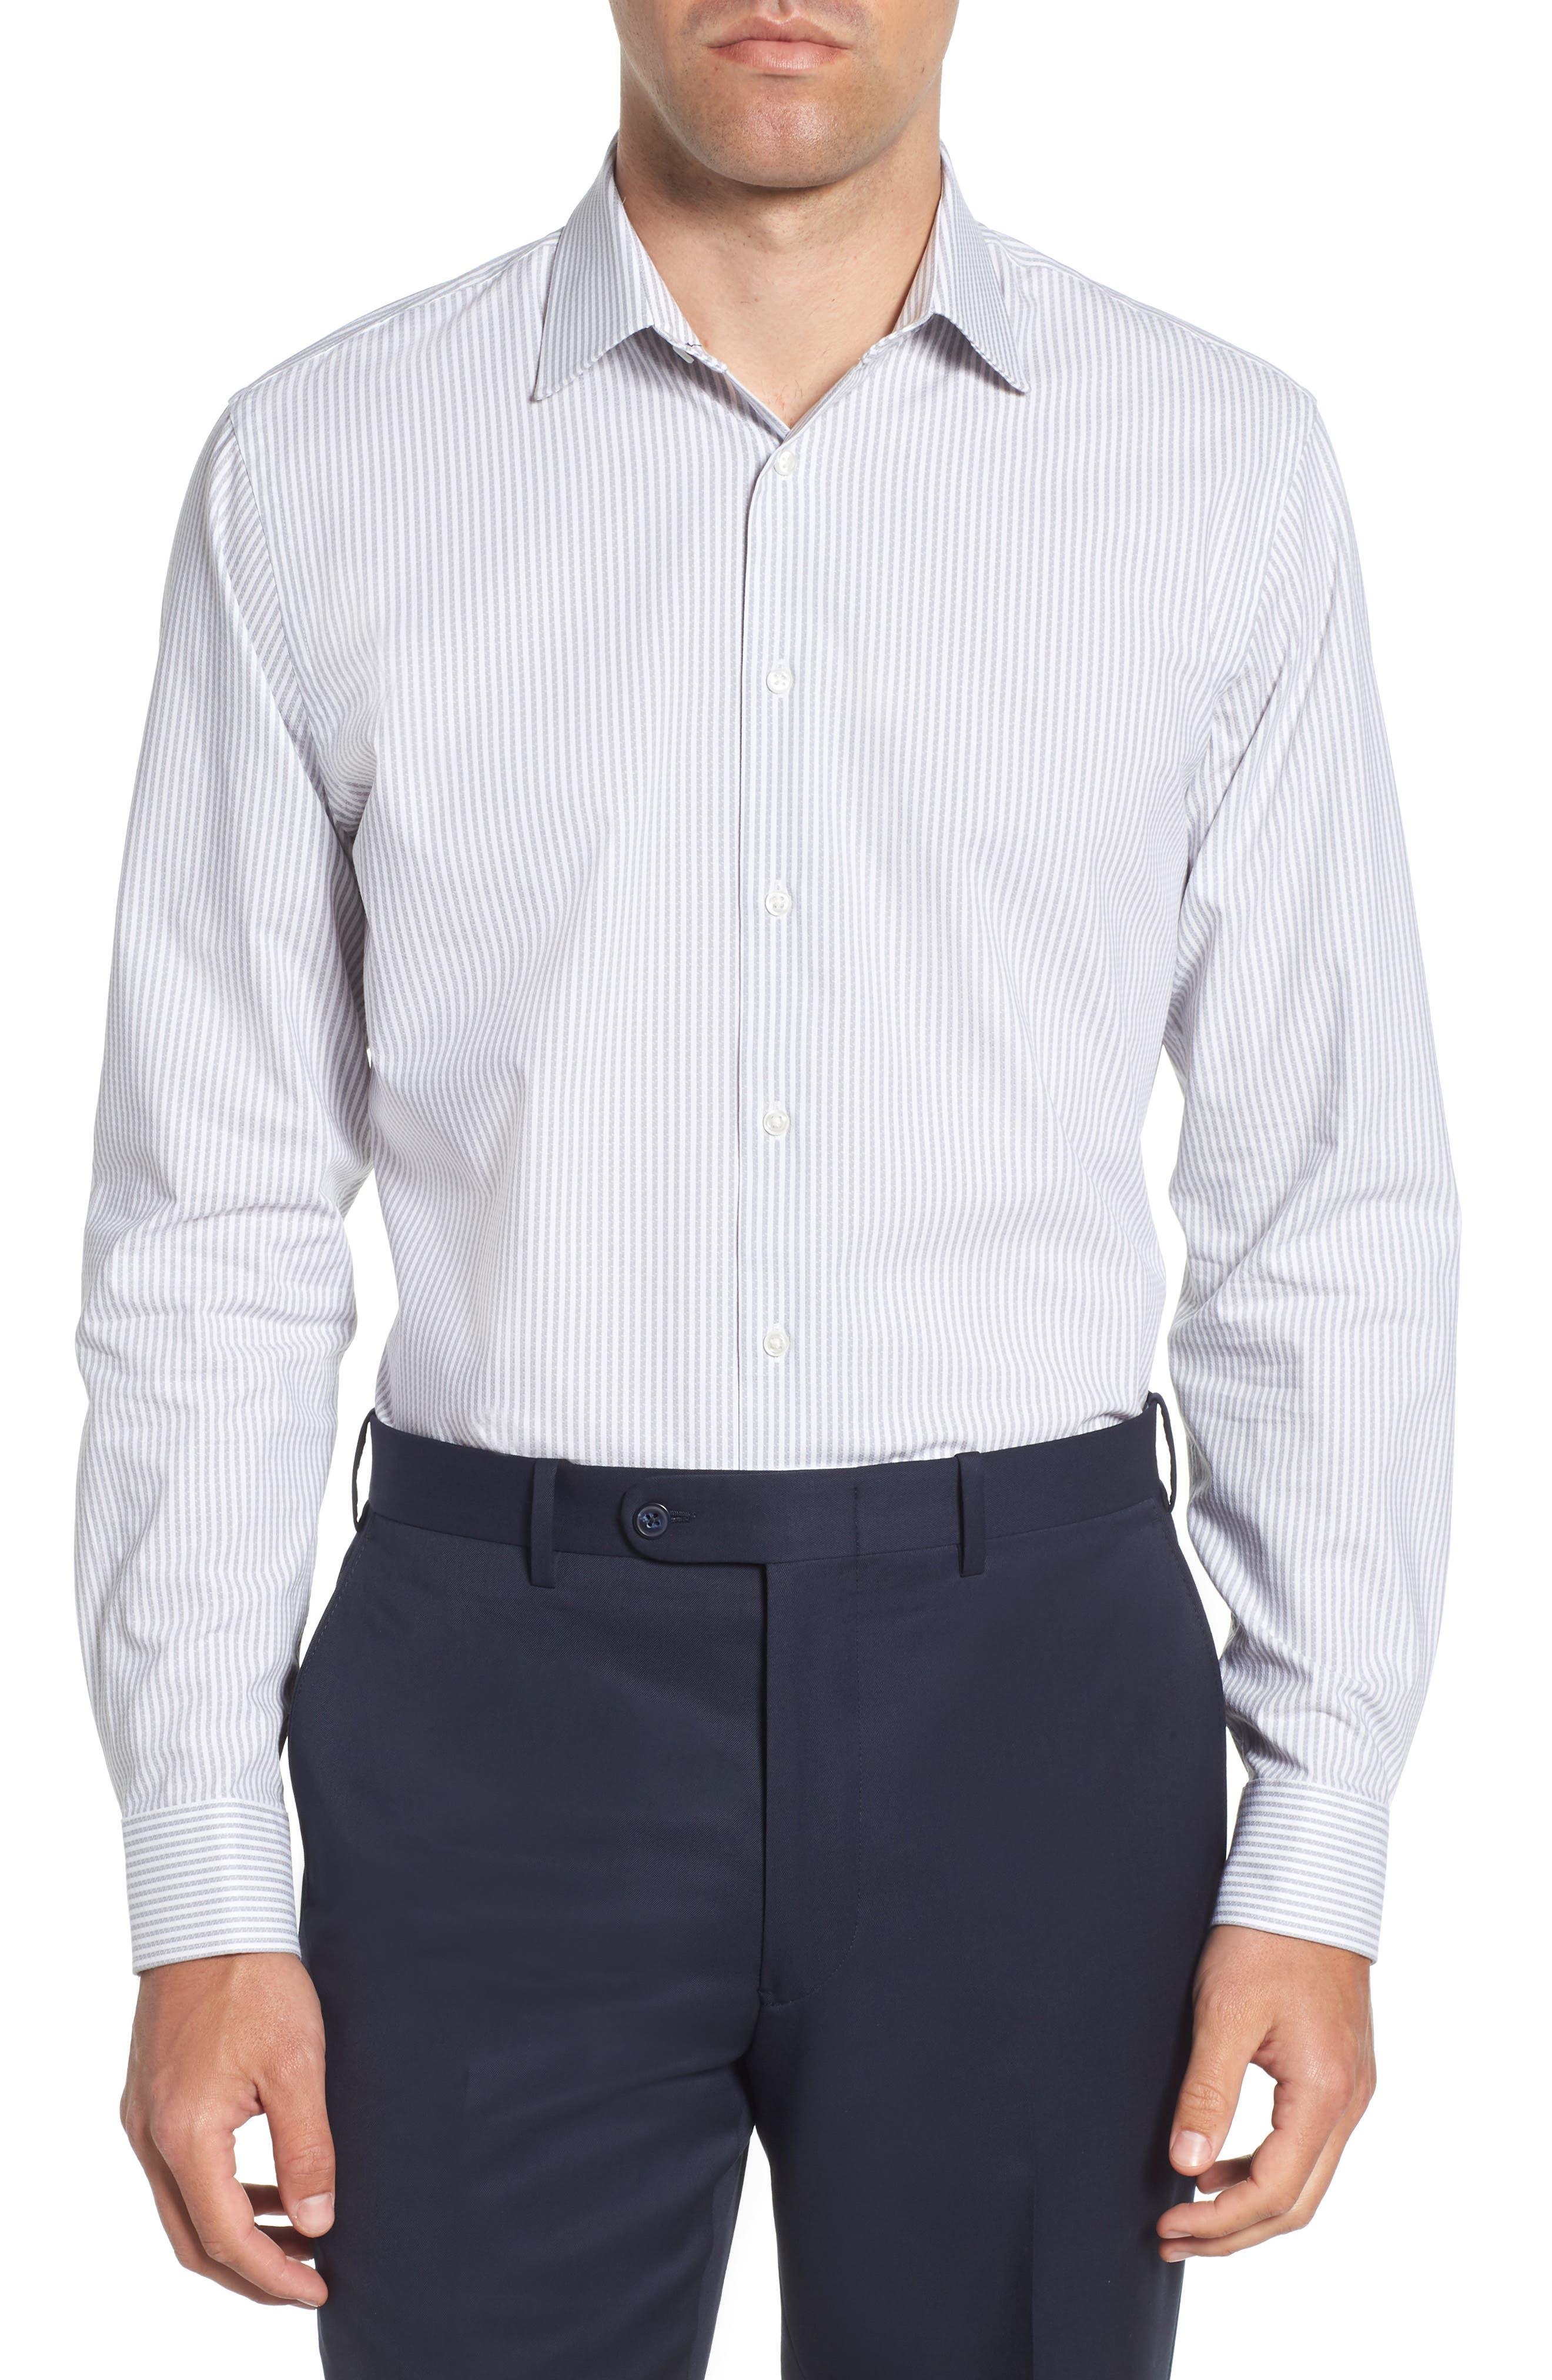 Tech-Smart Trim Fit Stripe Stretch Dress Shirt,                             Main thumbnail 1, color,                             050